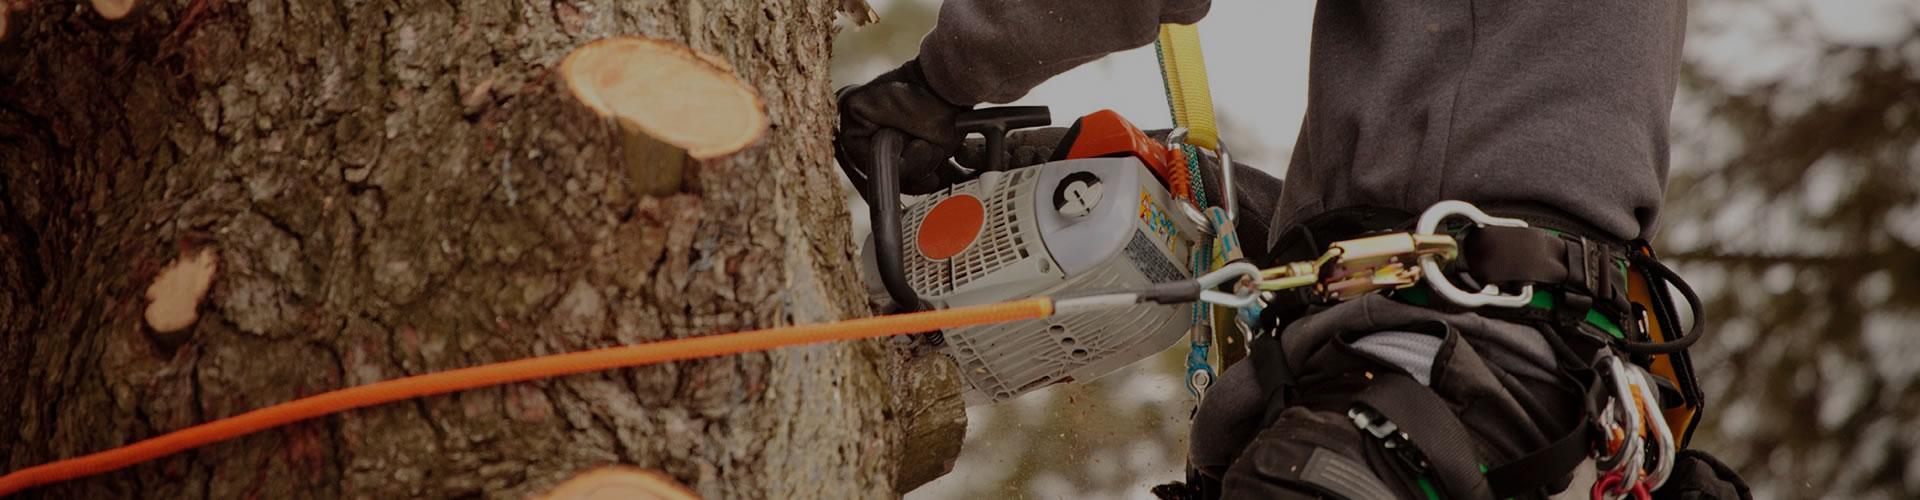 tree-services-floridas-tree-service-professional